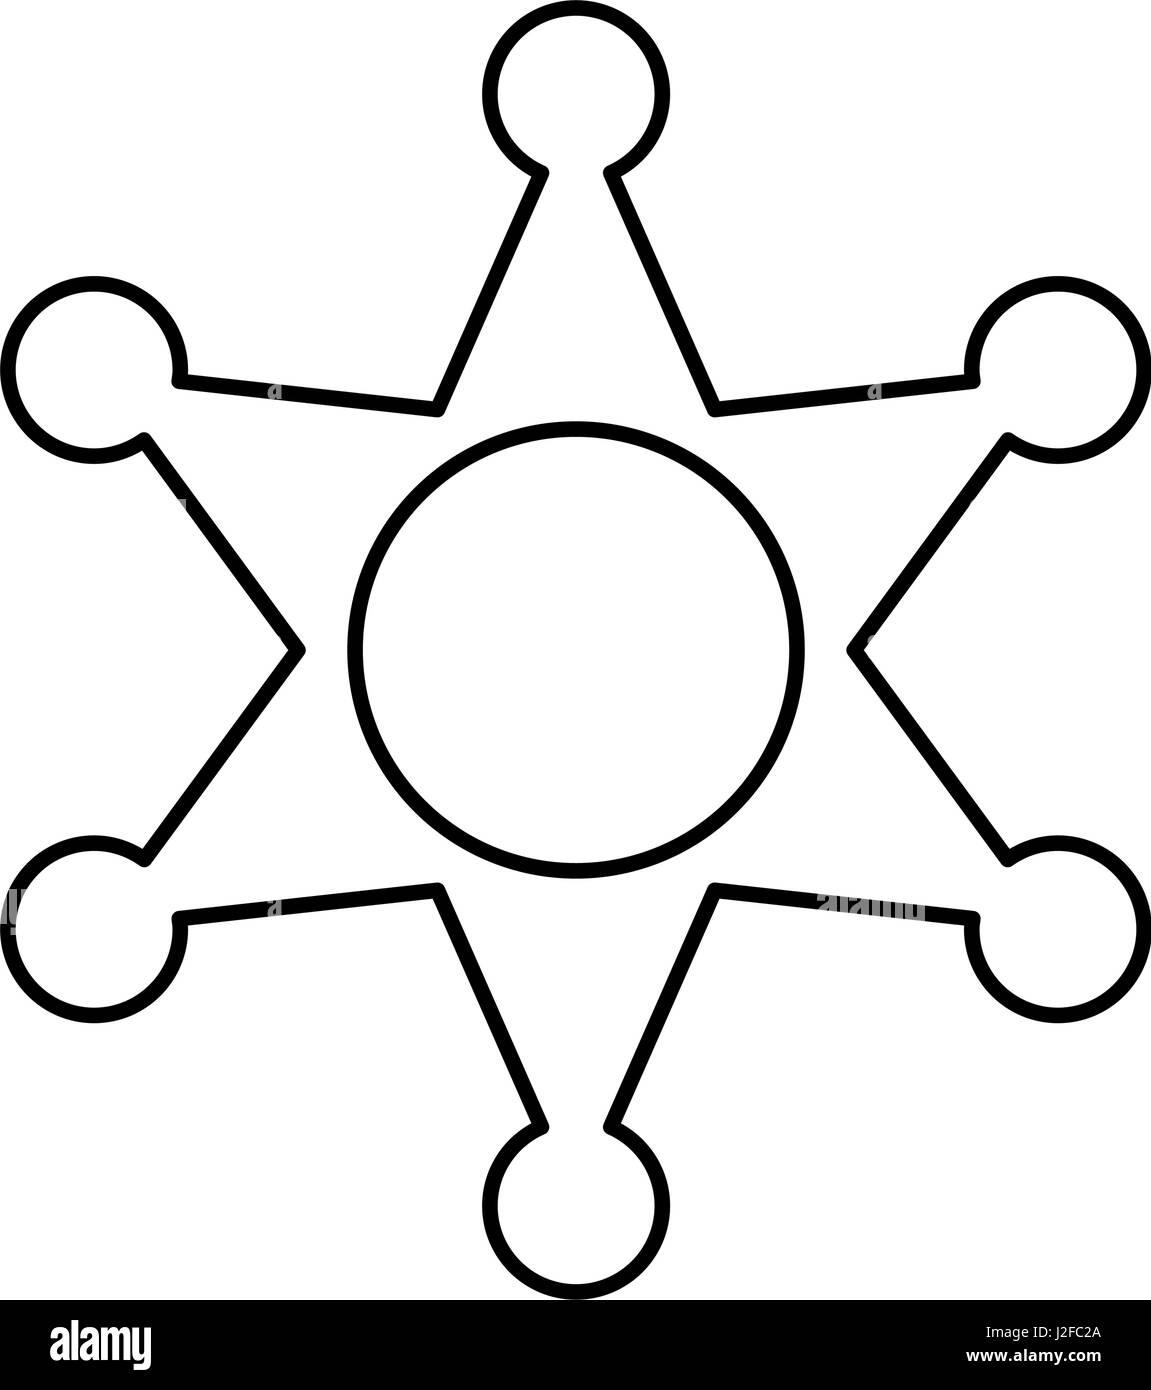 police badge icon image  - Stock Image